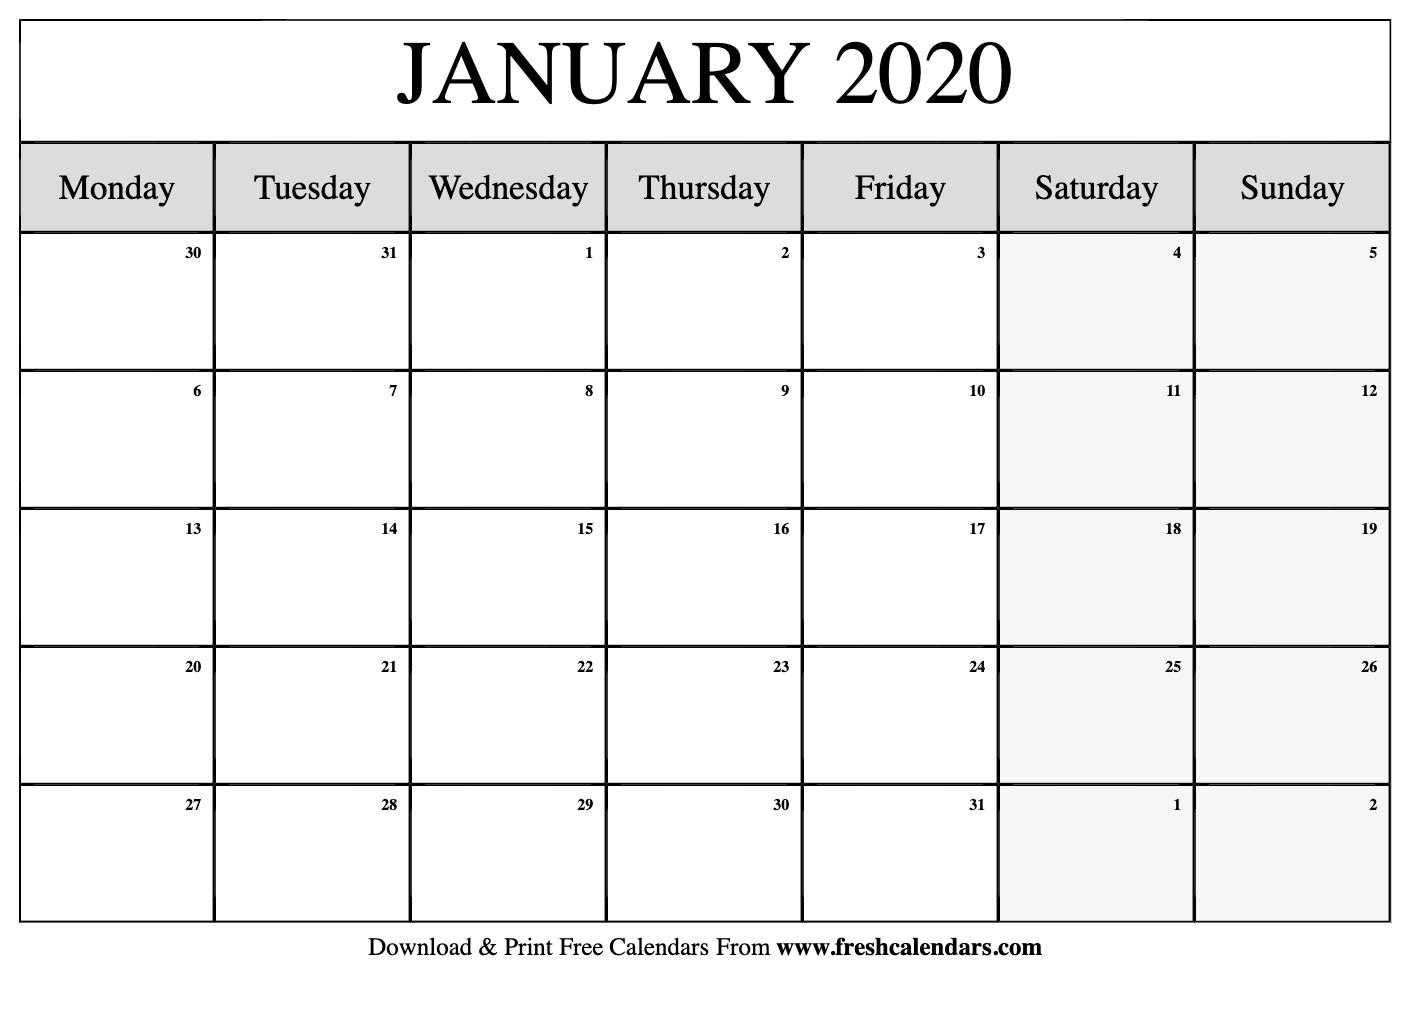 January 2020 Calendar Printable - Fresh Calendars regarding Blank 2020 Calendar Starting On Saturday Printable Free